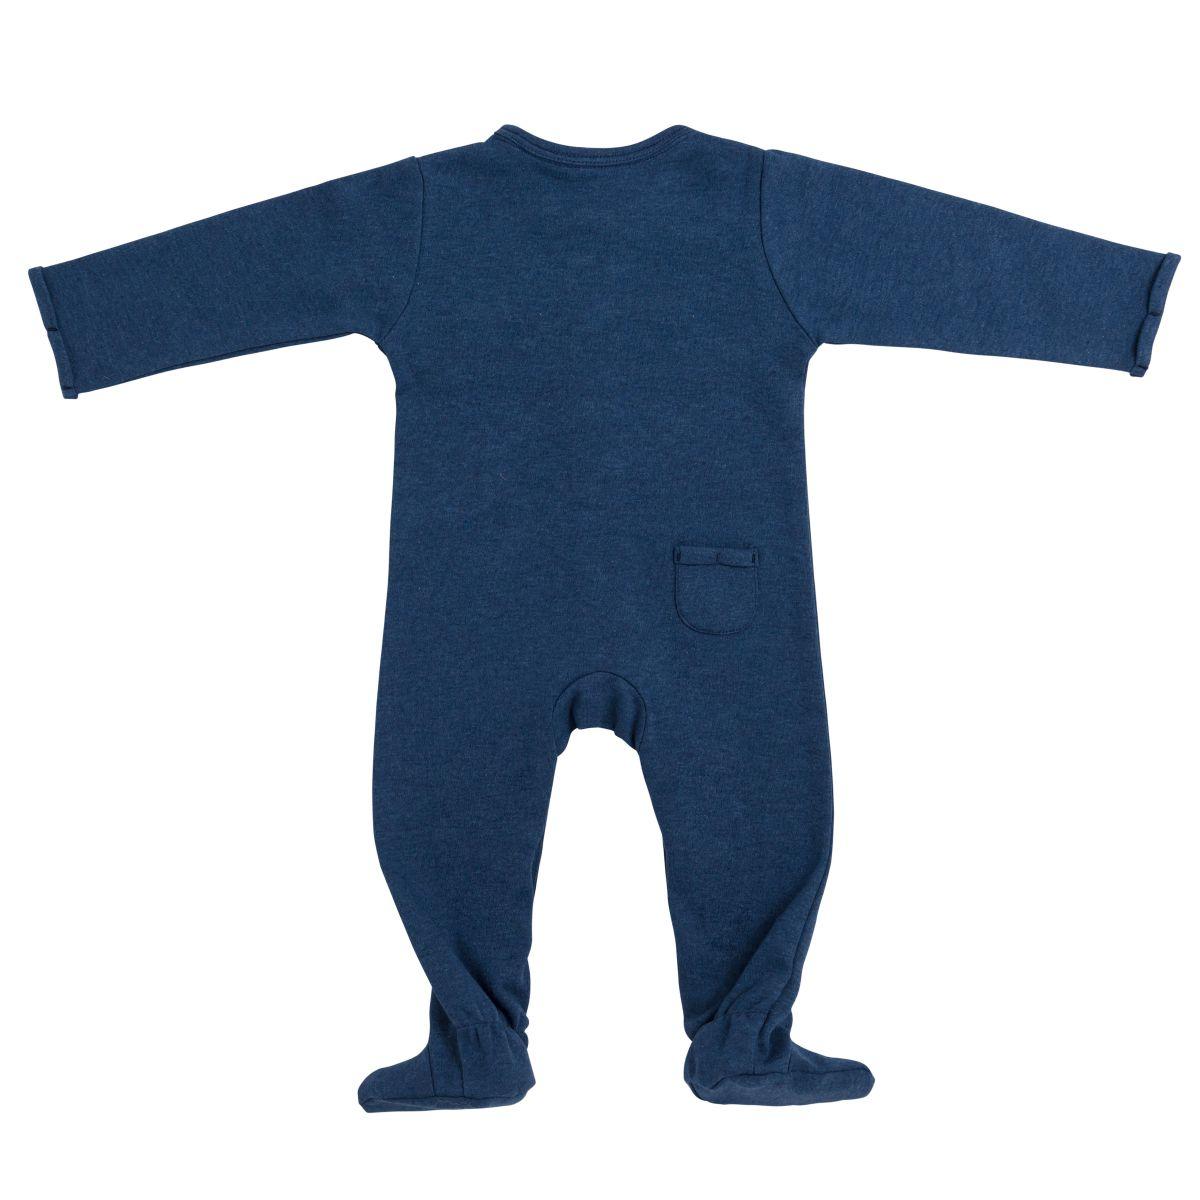 babys only 3546828 boxpakje met voetjes melange 68 jeans 2